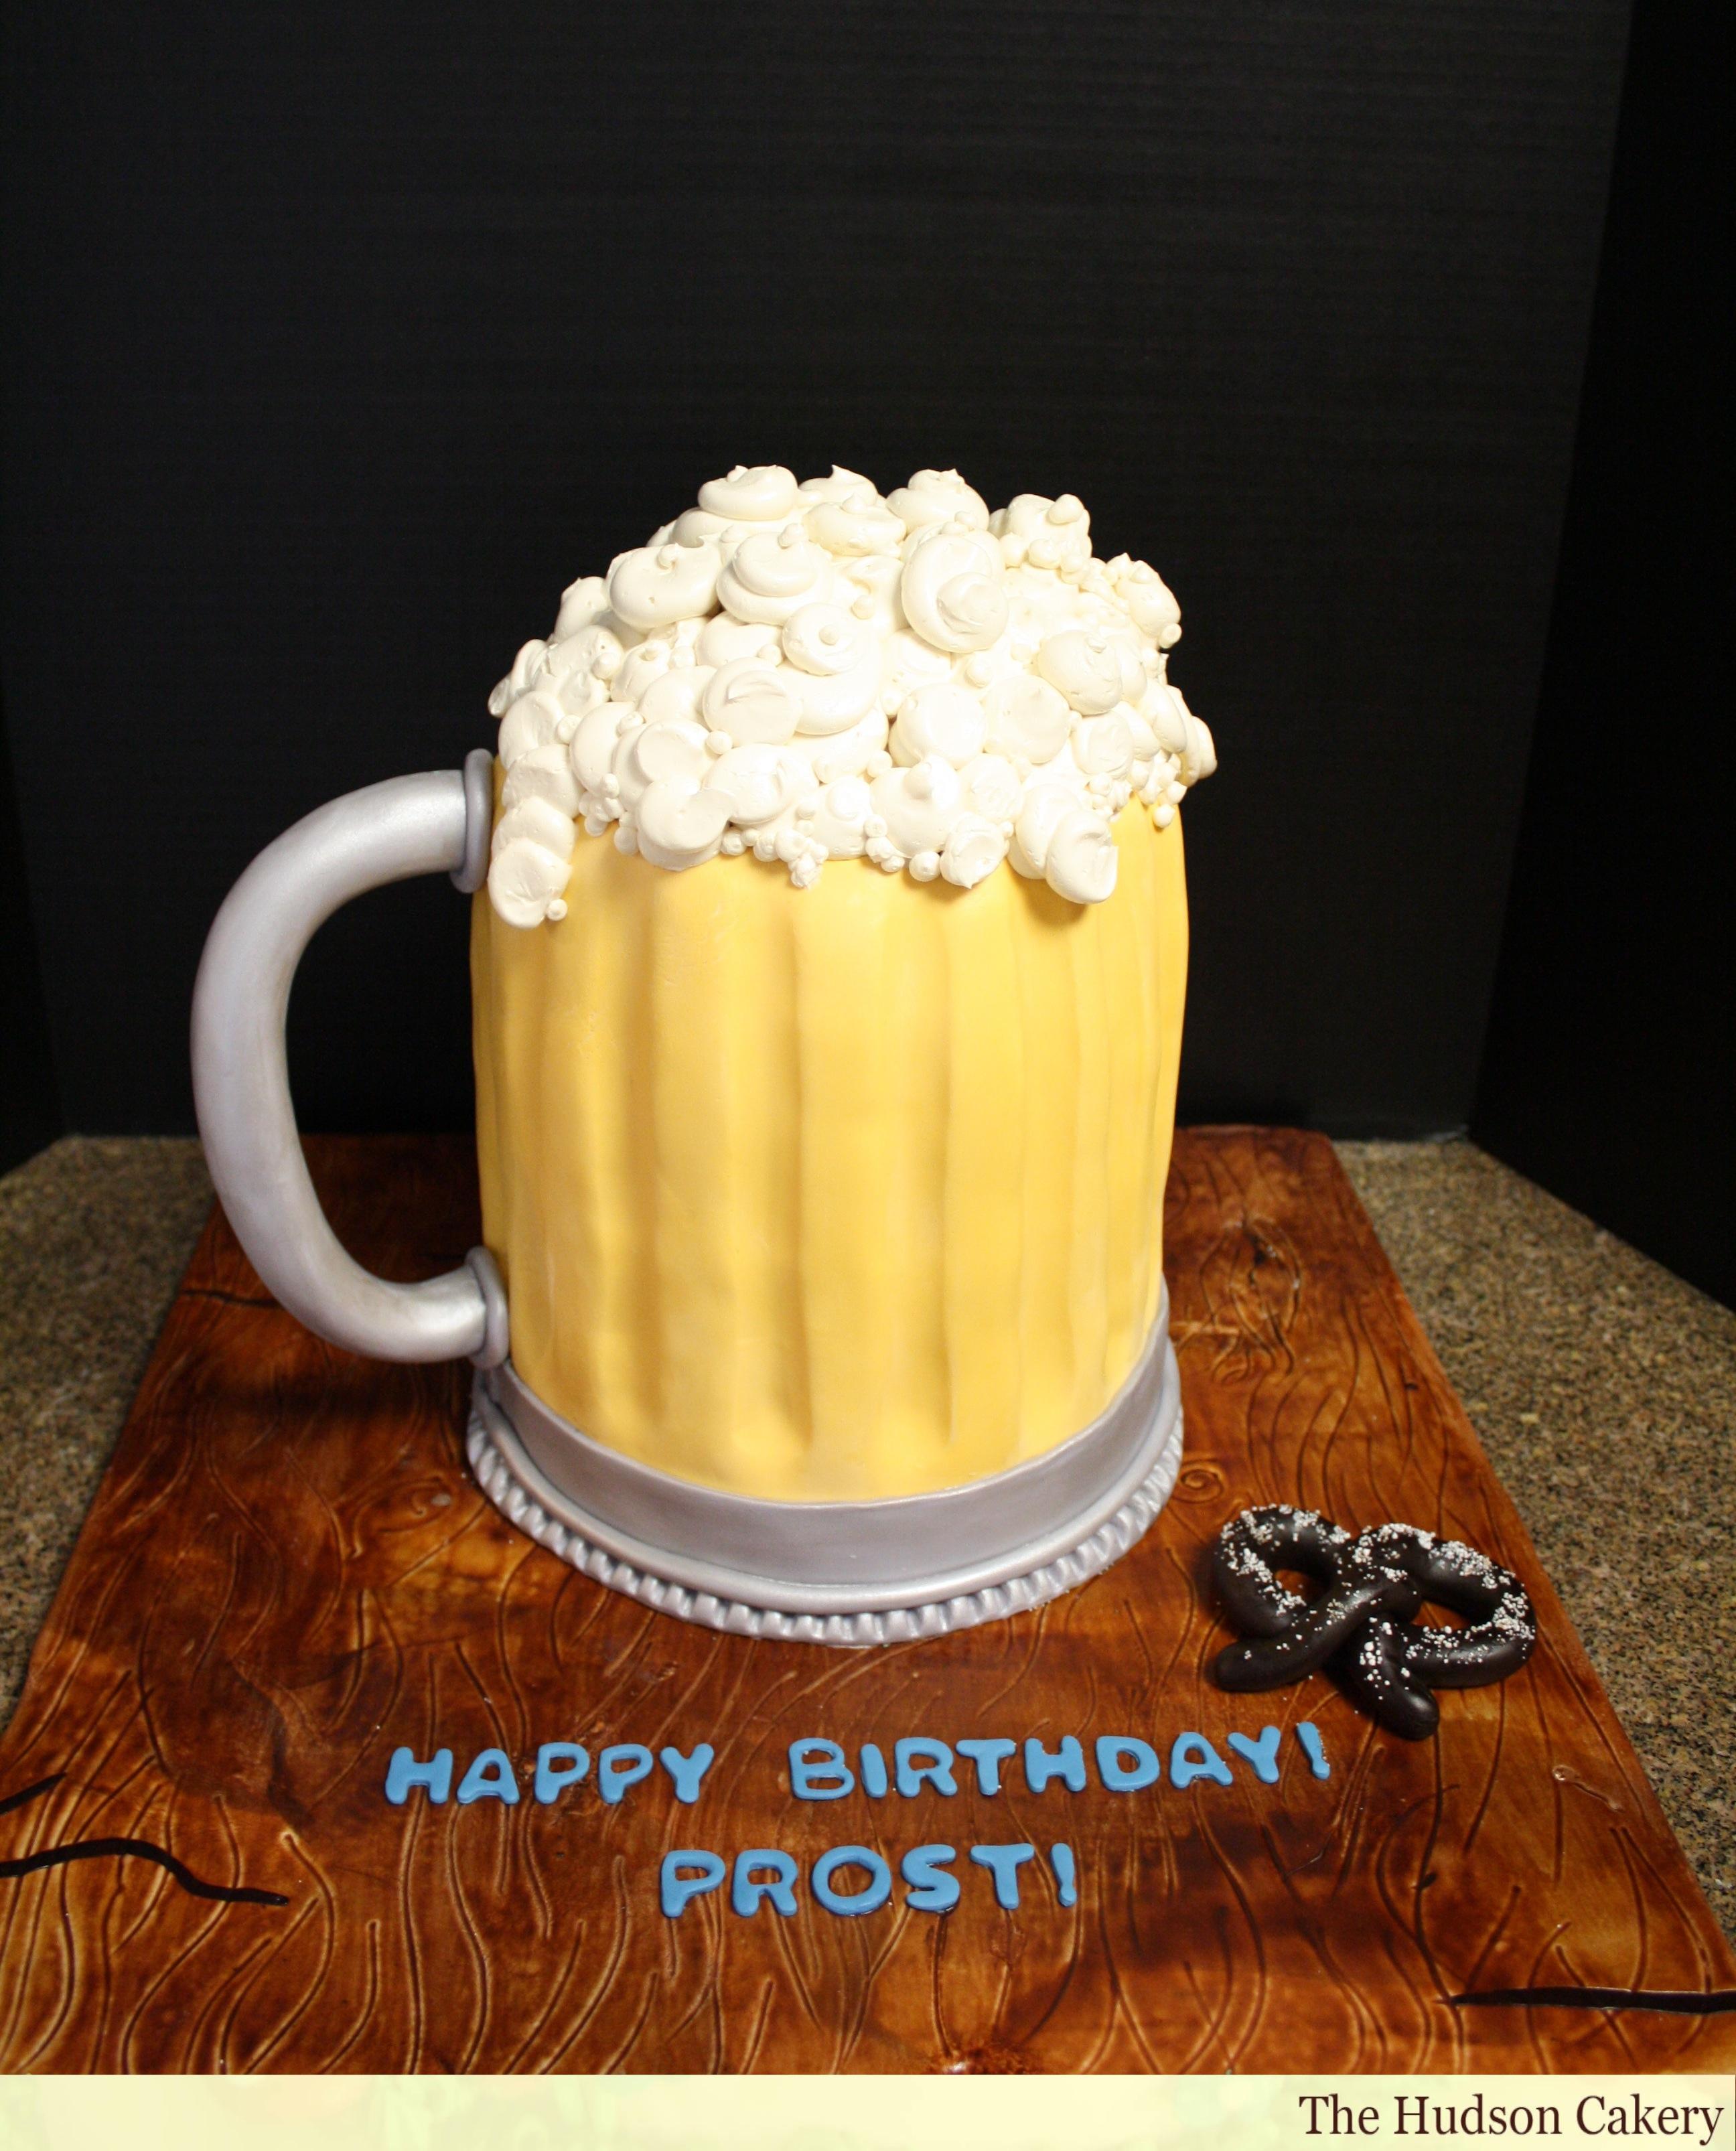 Remarkable 8 Happy Birthday Beer Mug Cakes Photo Beer Birthday Cake Mug Funny Birthday Cards Online Sheoxdamsfinfo